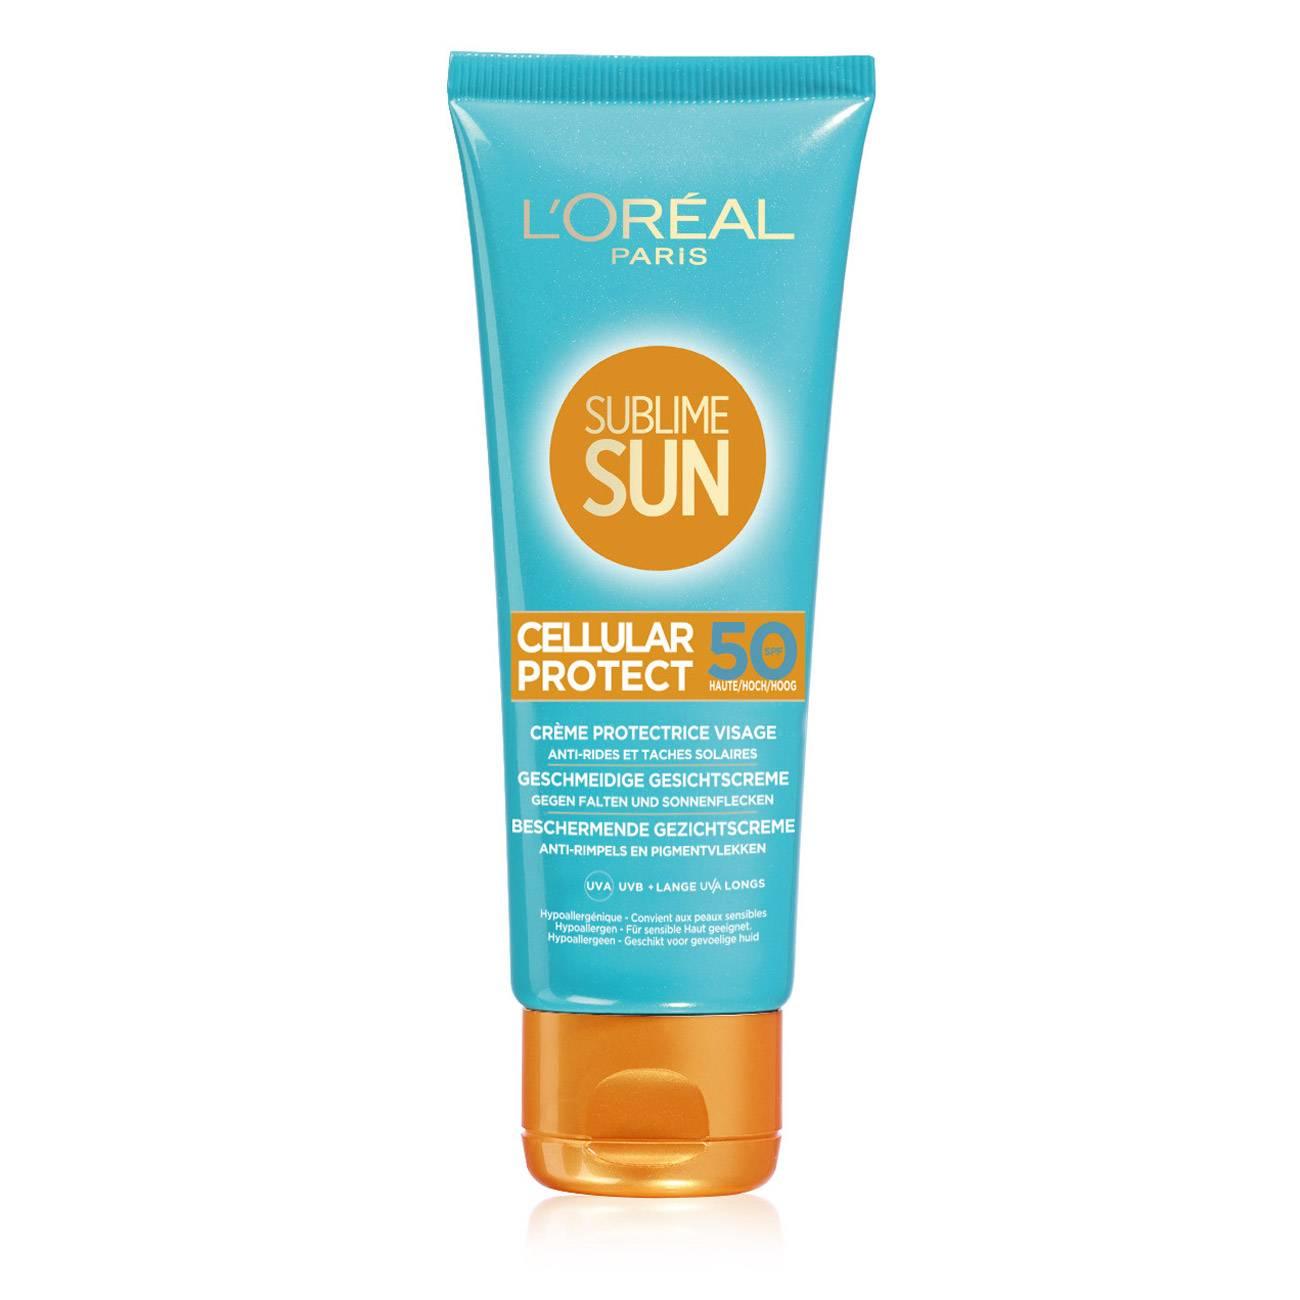 SUBLIME SUN CREME CELLULAR PROTECT SPF 50 75ml poza